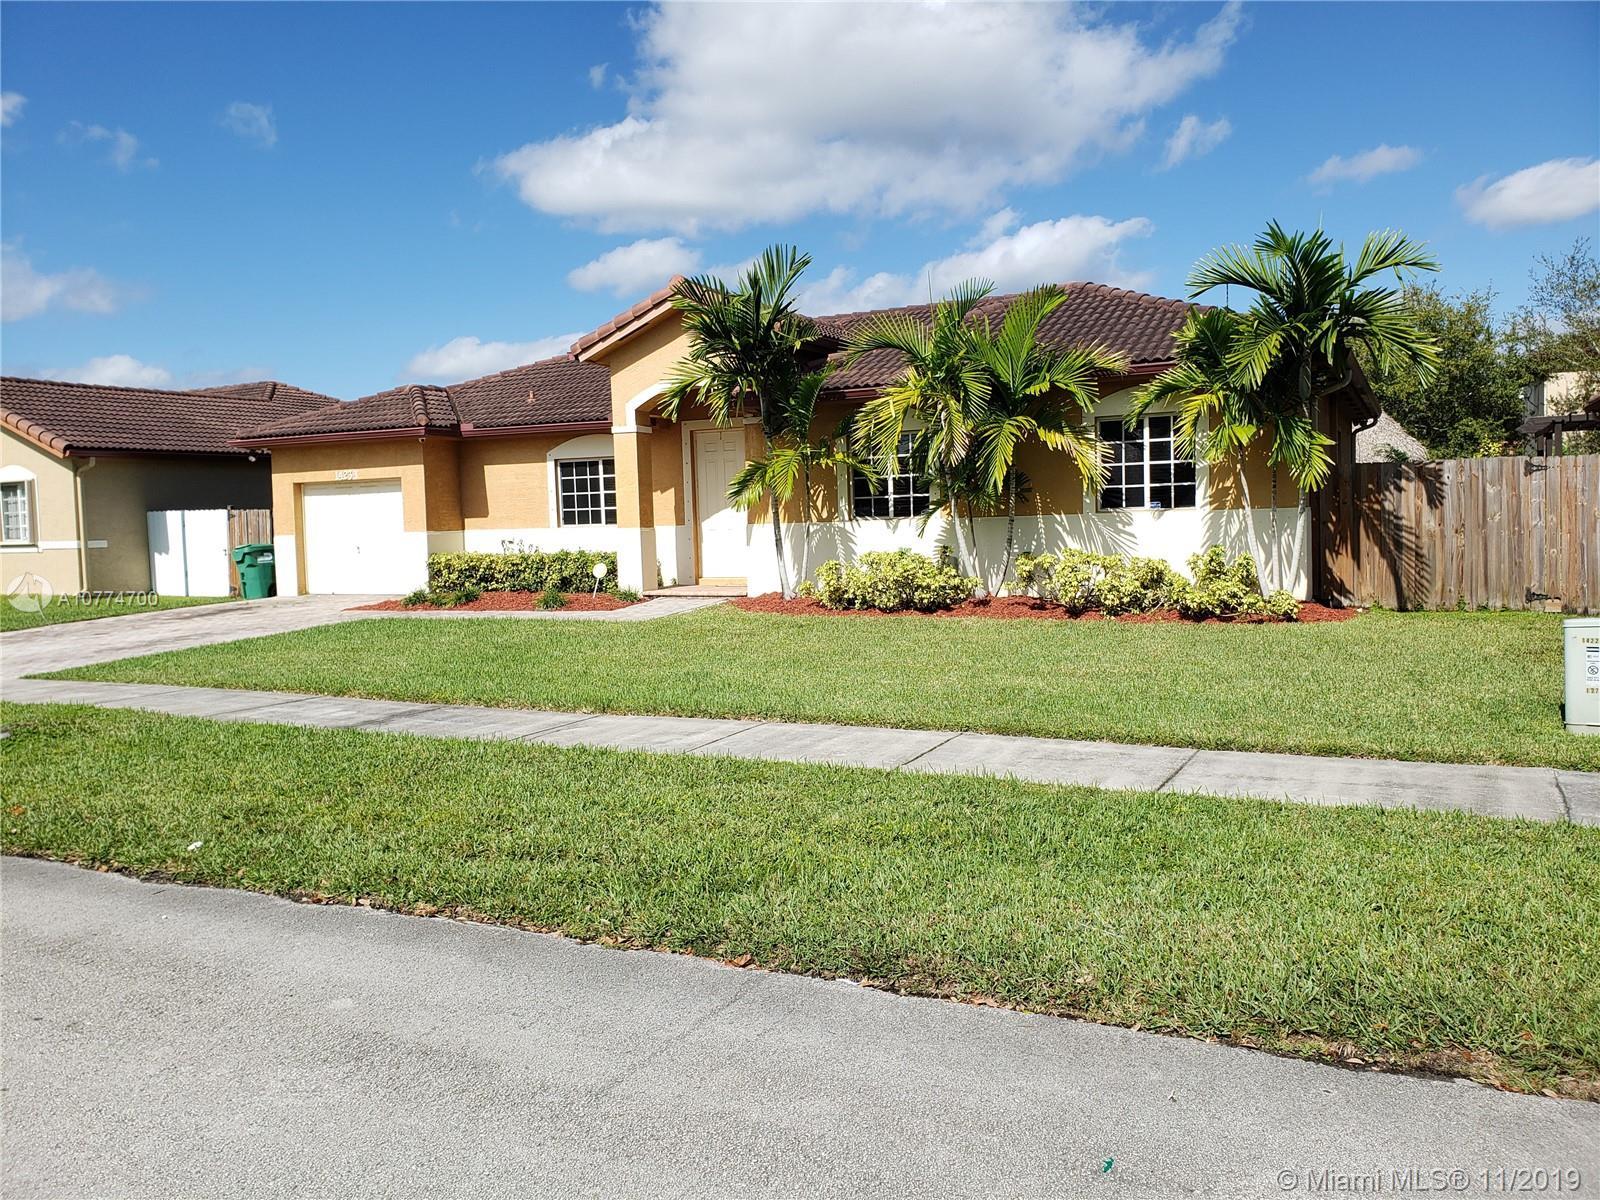 14233 SW 289th Ter, Homestead, FL 33033 - Homestead, FL real estate listing